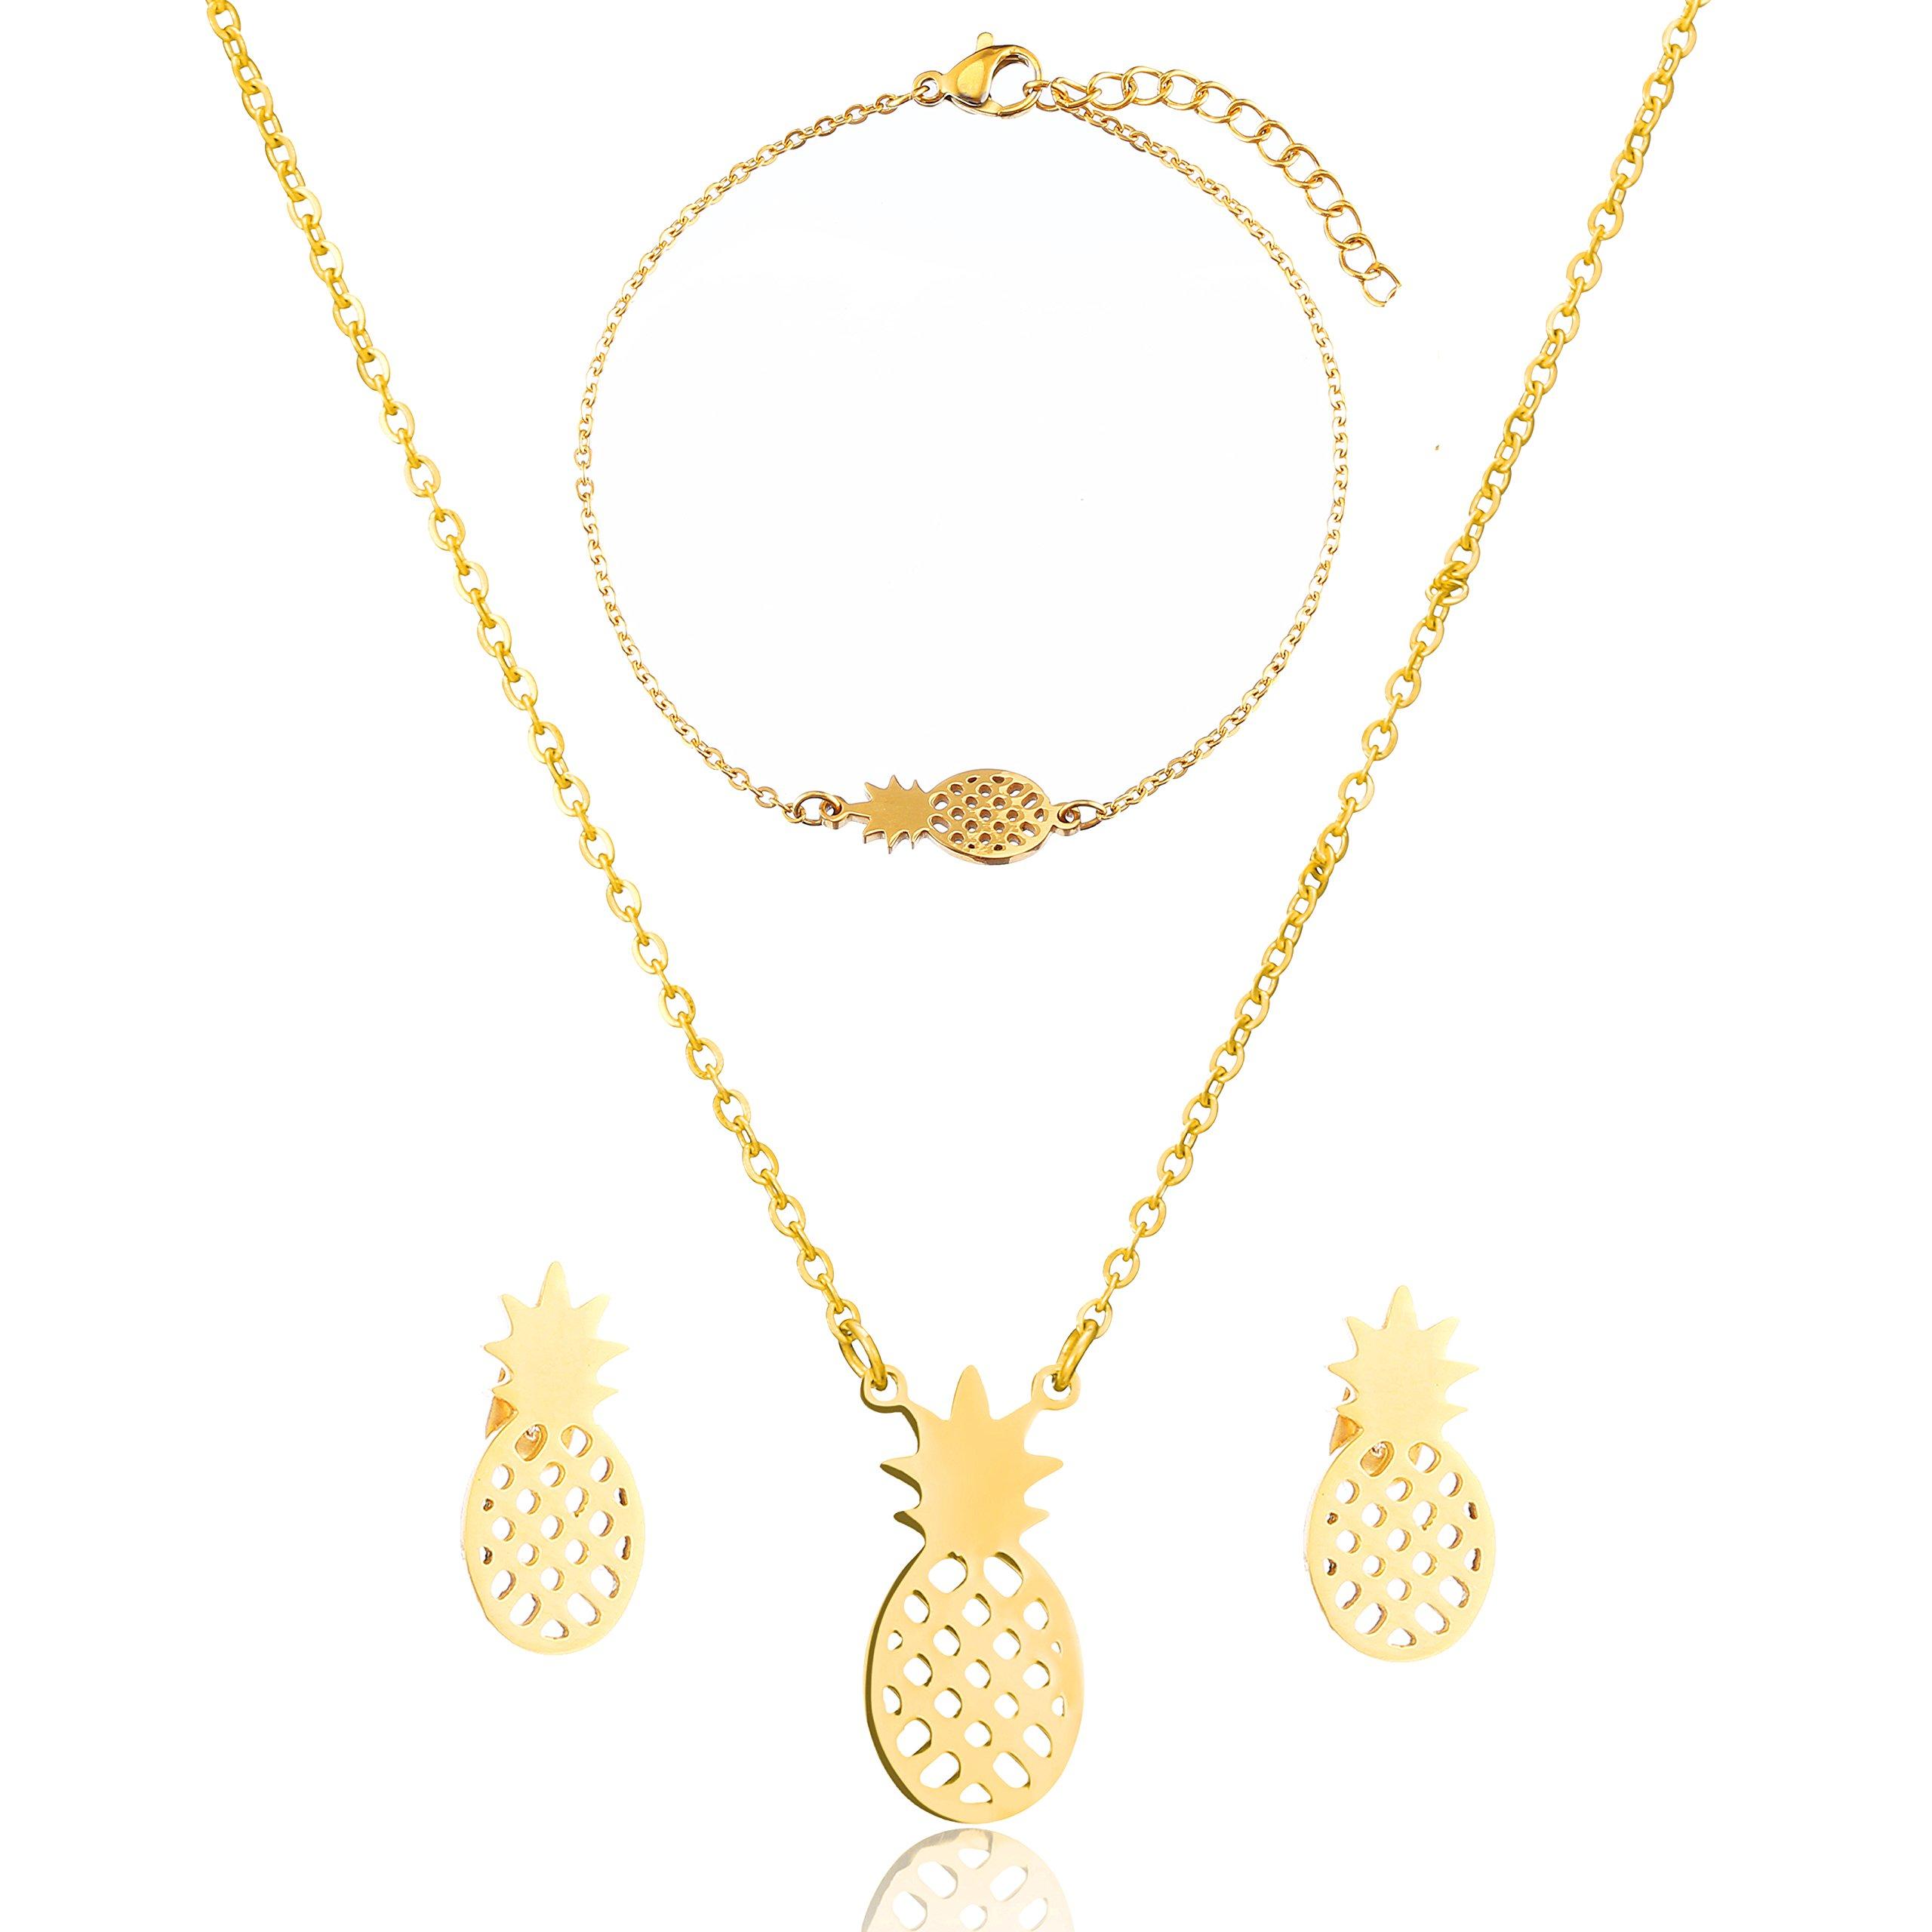 SKQIR Womens Stainless Steel Pineapple Jewelry Sets (Earrings+Bracelets+Necklaces Jewelry Set) (Gold Set)